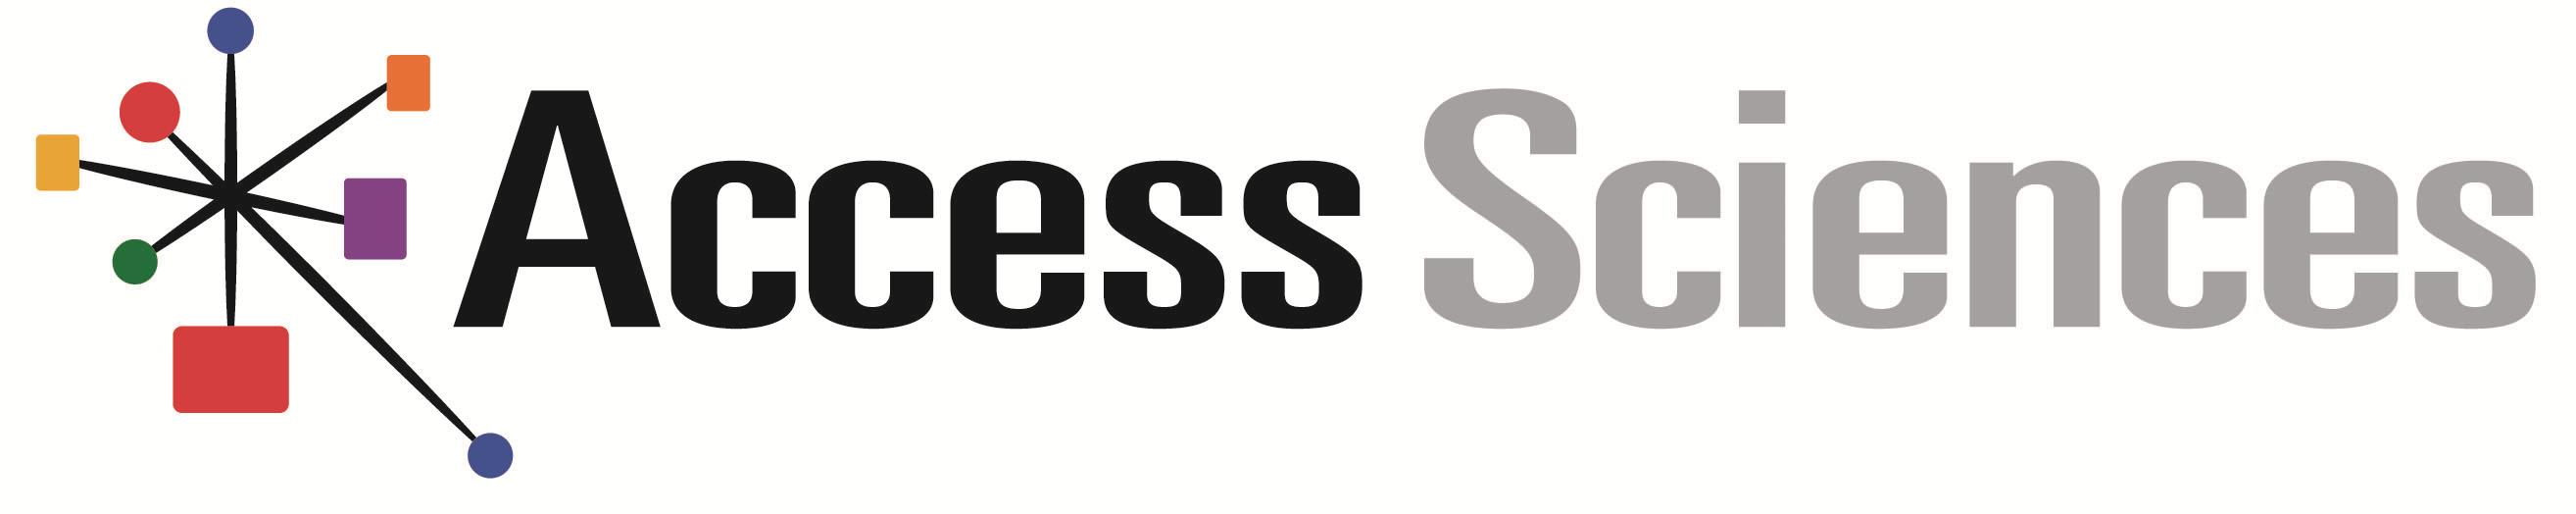 Access Sciences Corporation logo